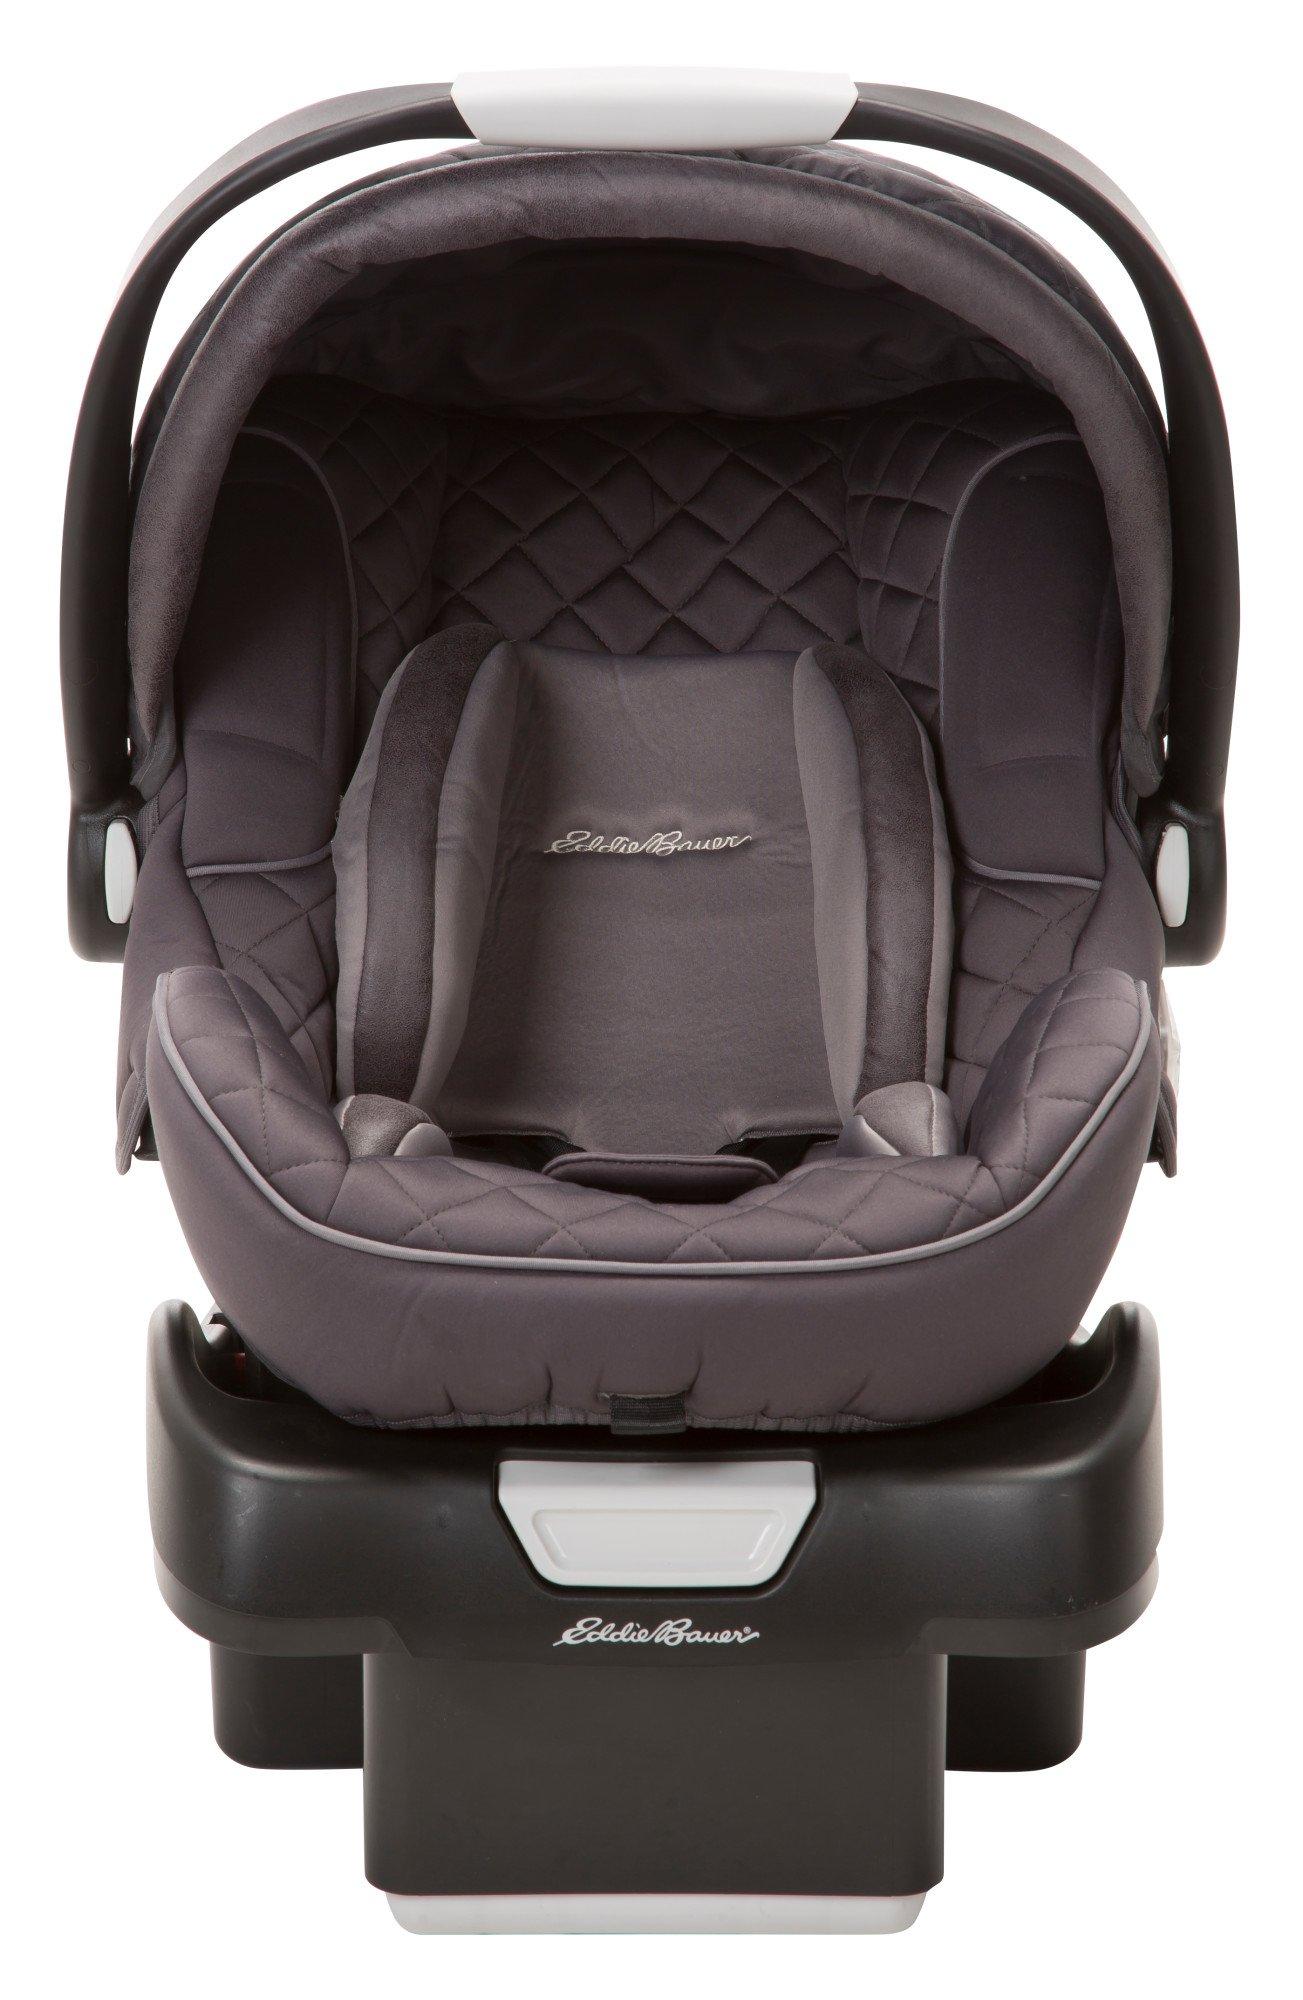 Eddie Bauer SureFit Infant Car Seat Graphite